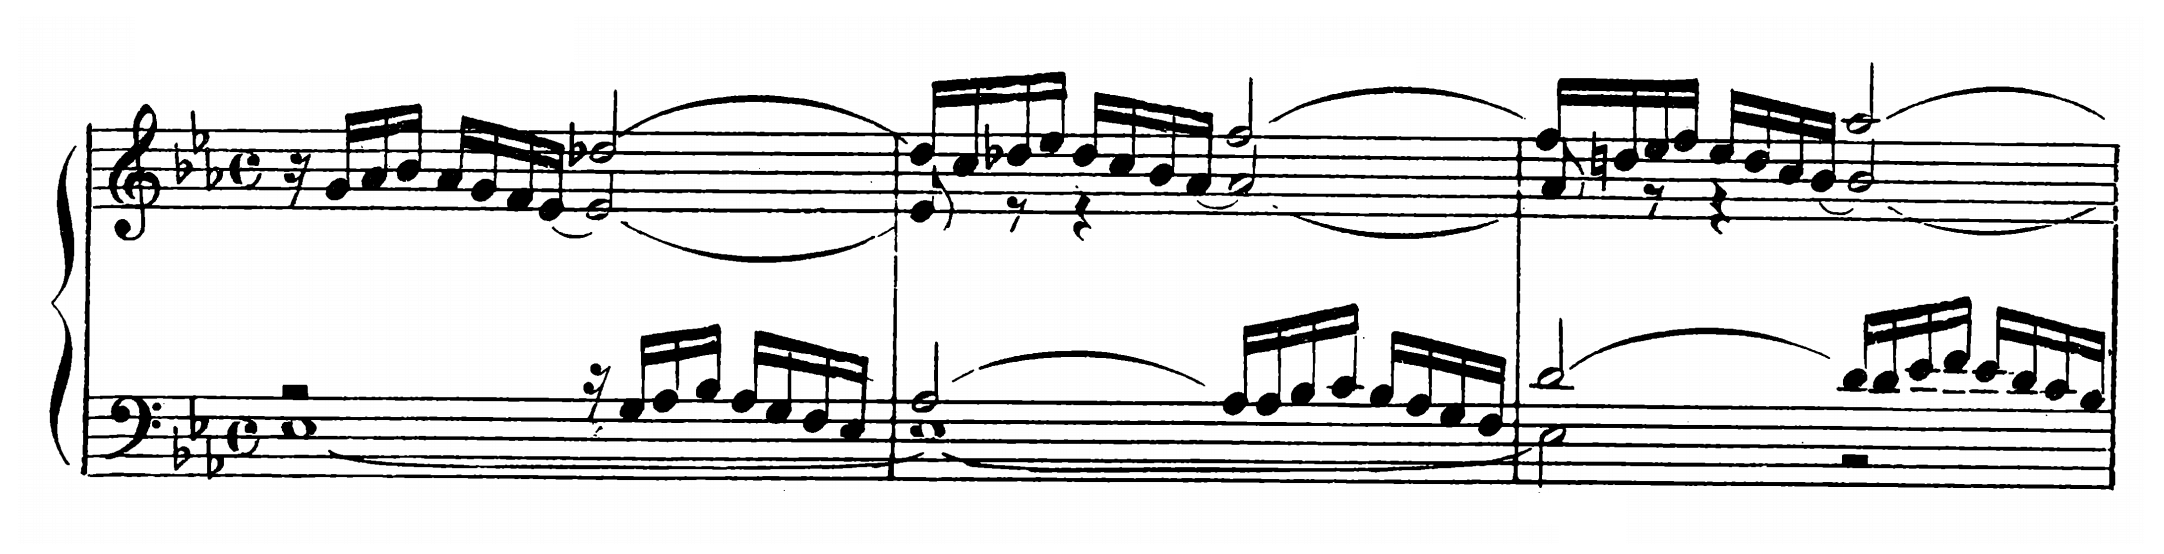 Bach Prelude And Fugue No7 In E Major Bwv 852 Analysis